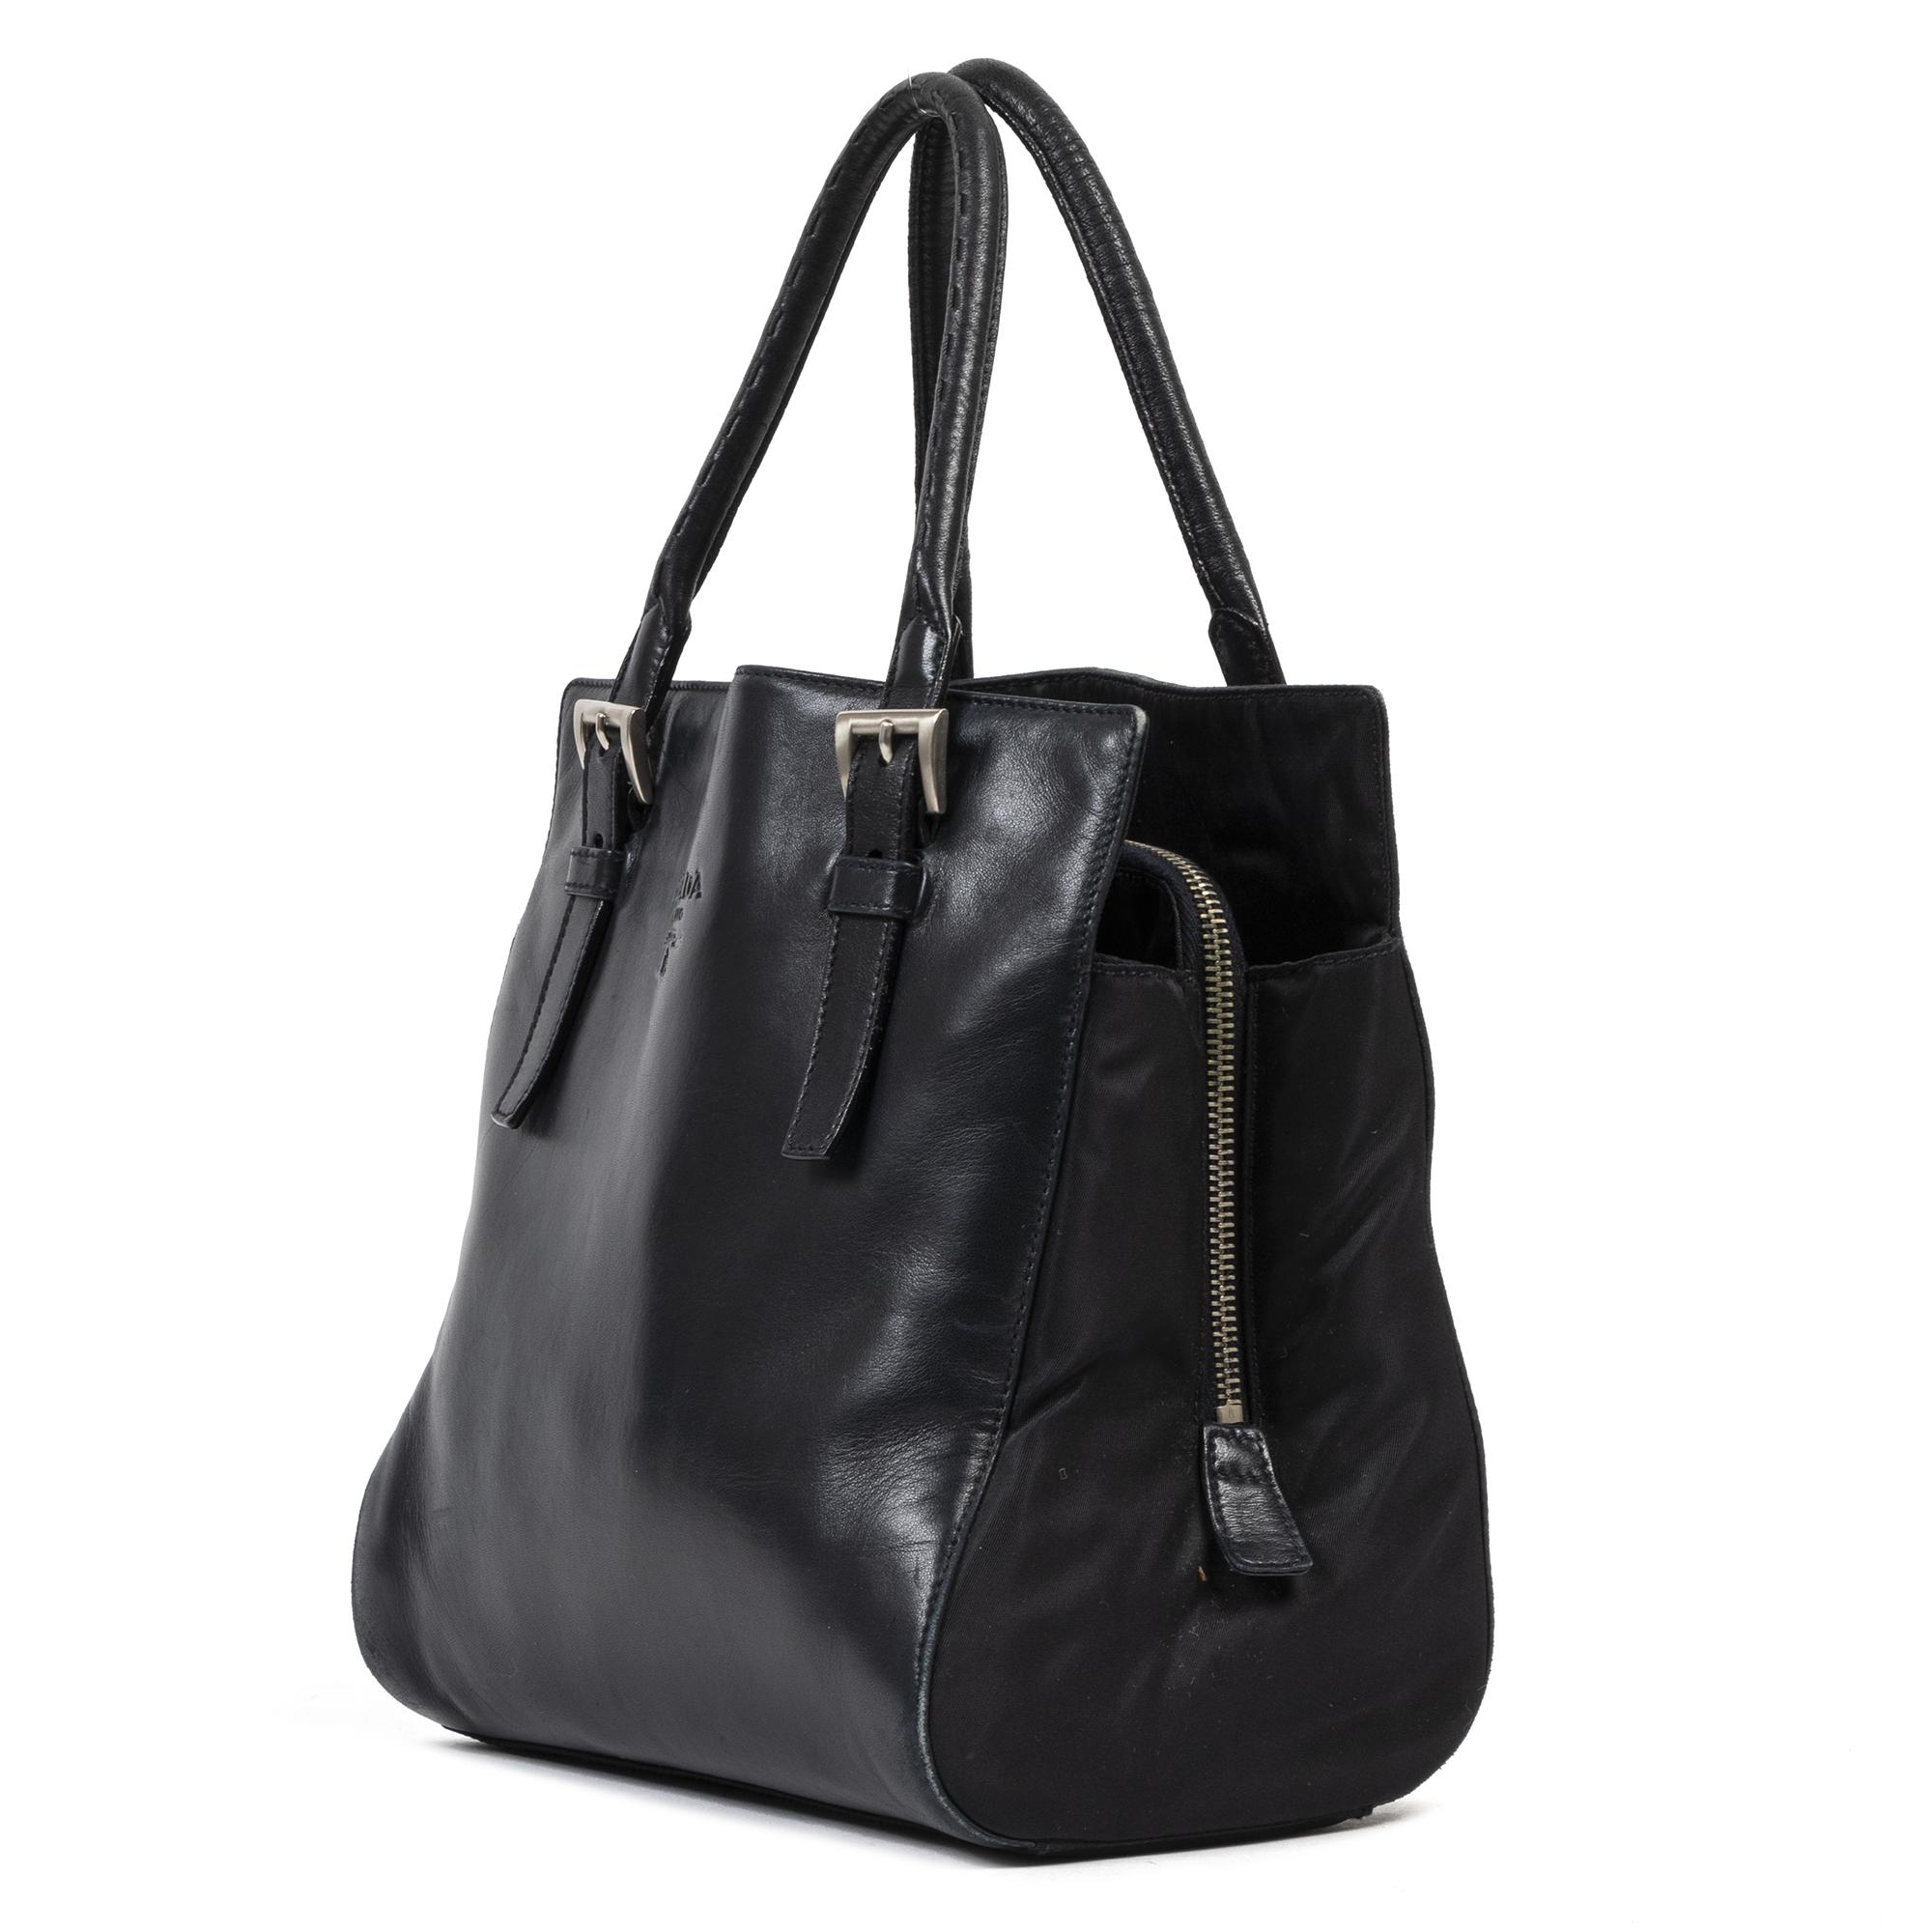 Authentic secondhand Prada Black Leather Square Top Hande Bag luxury vintage webshop fashion safe secure online shopping